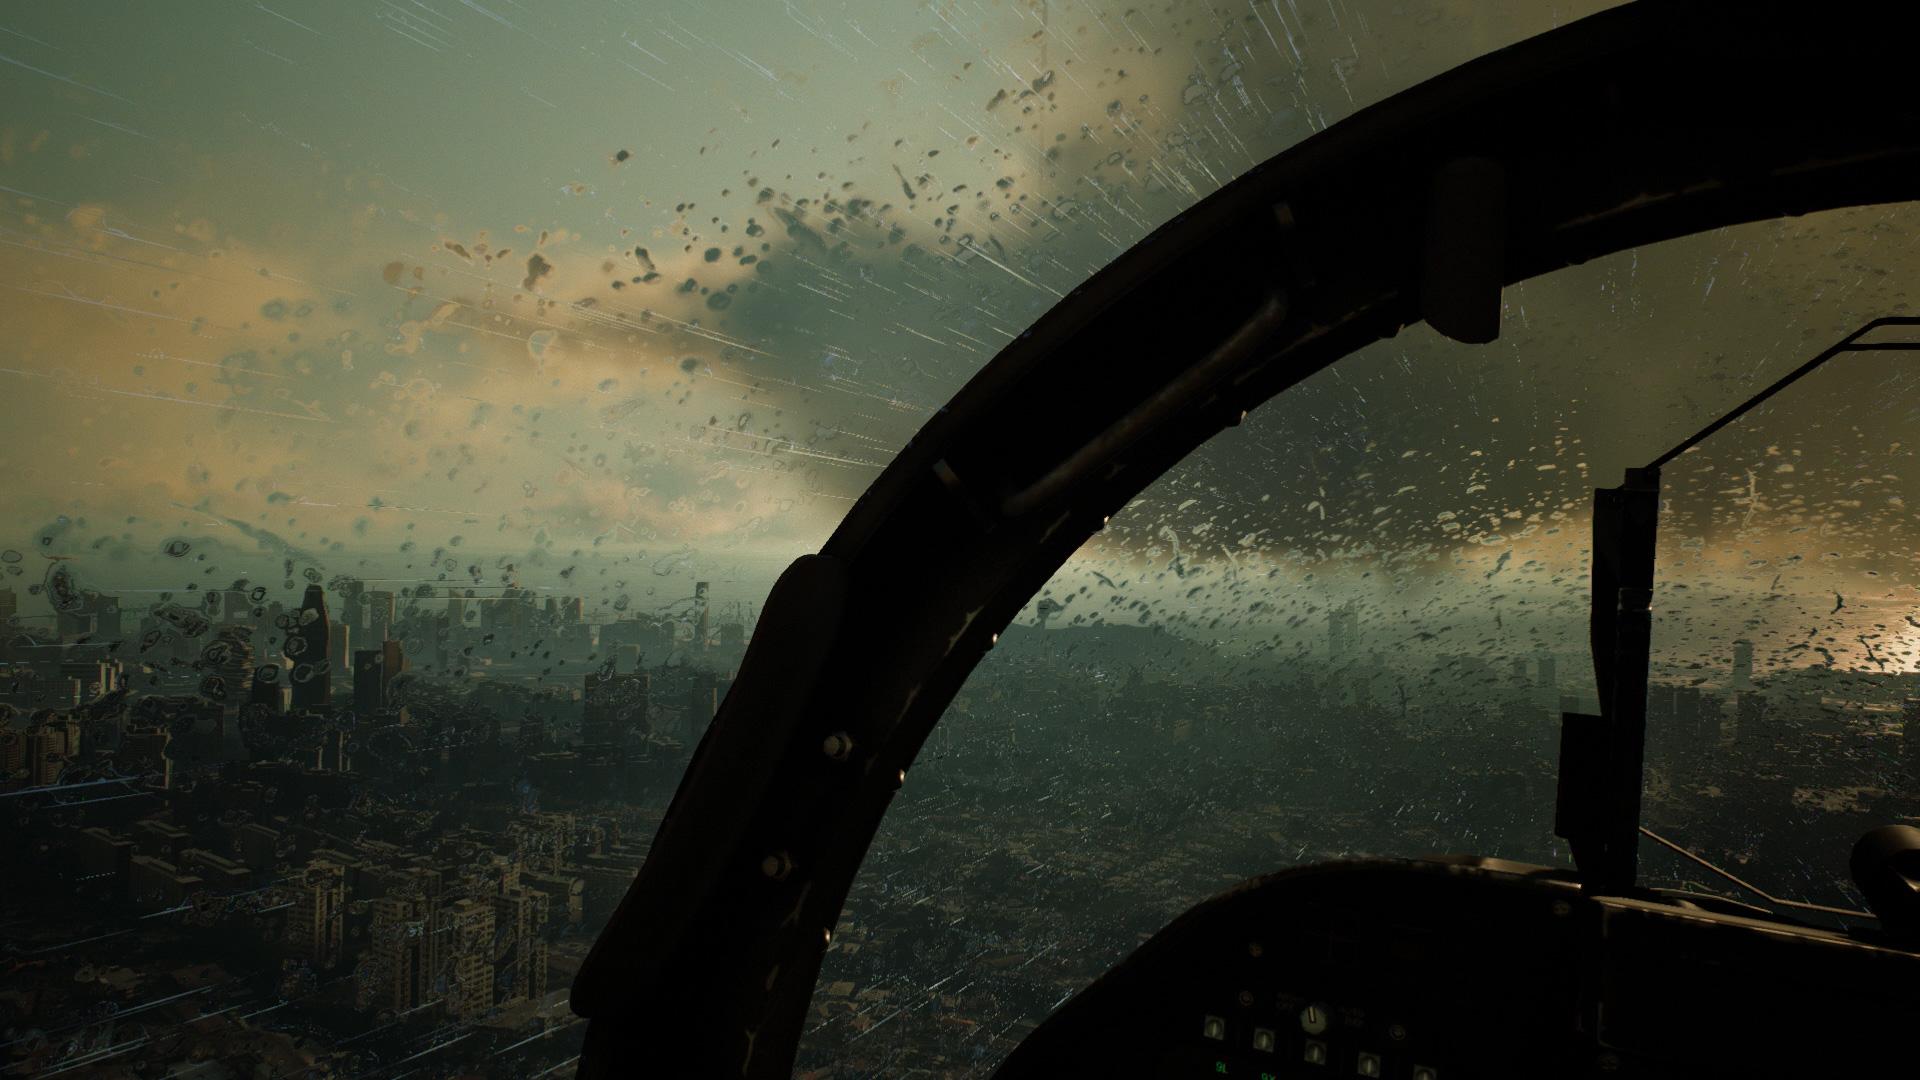 http://www.idgtv.es/archivos/201806/ace-combat-7-skies-unknown-img2.jpg